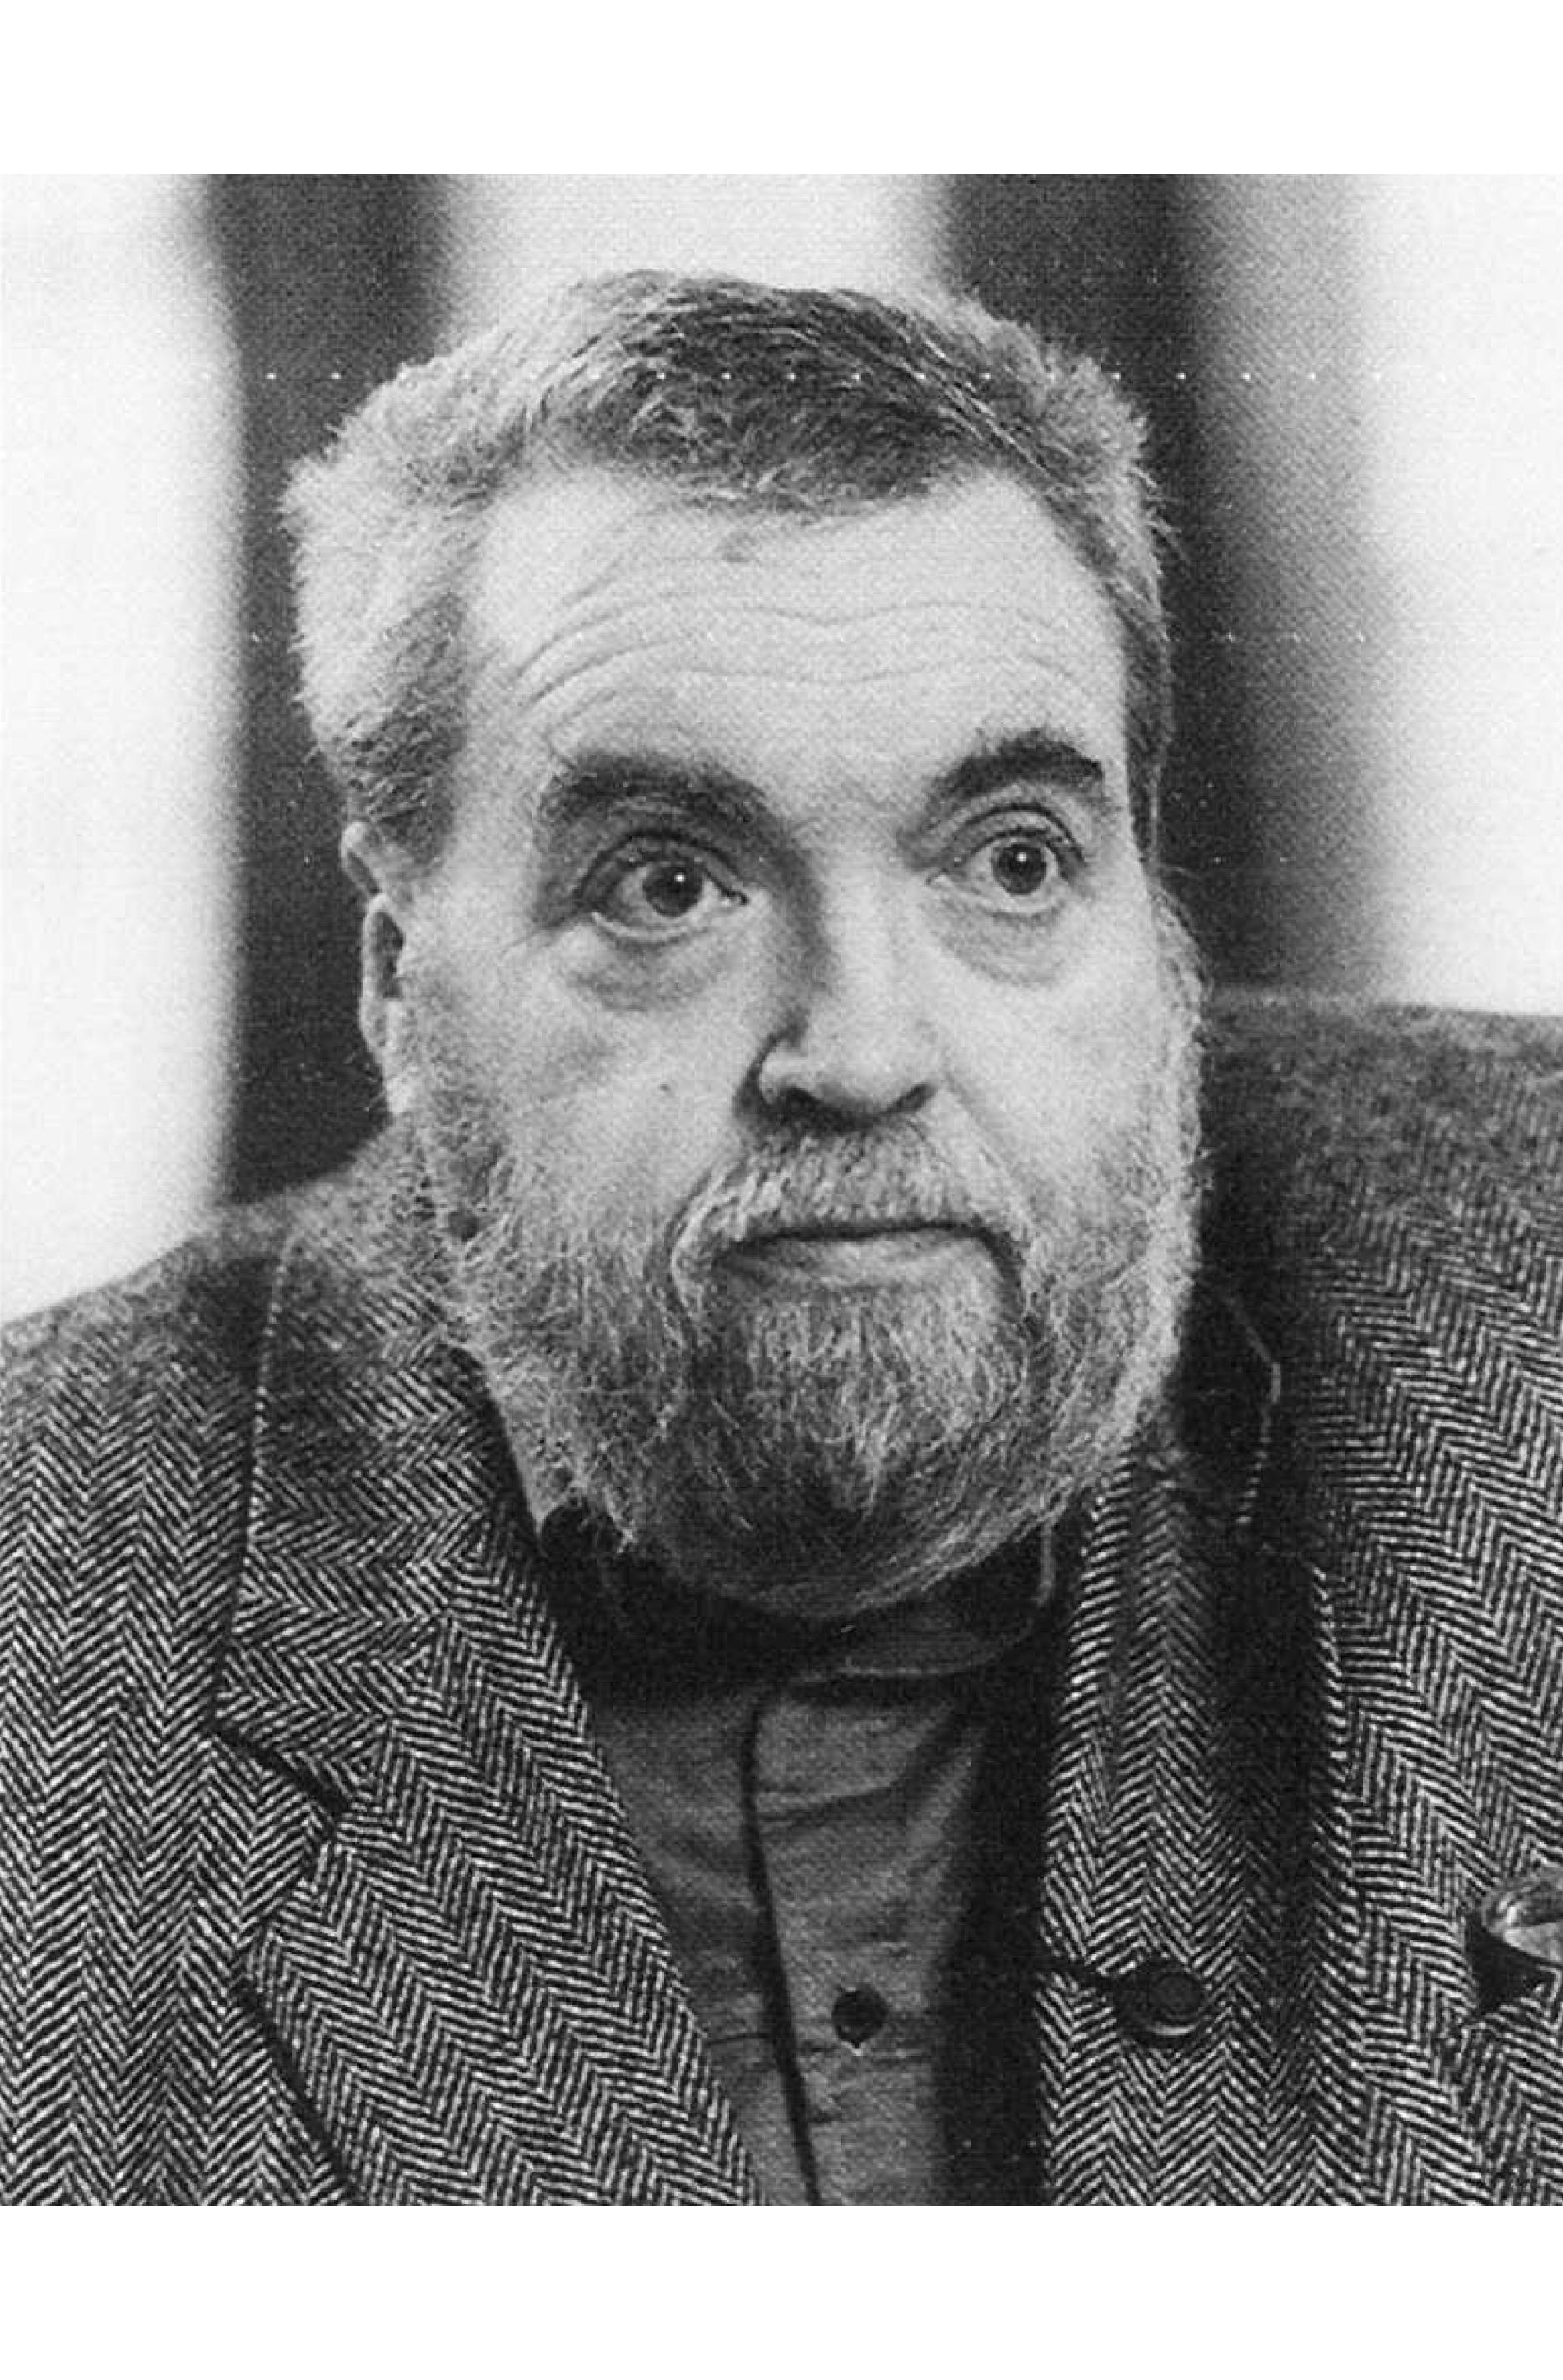 Helmut Qualtinger